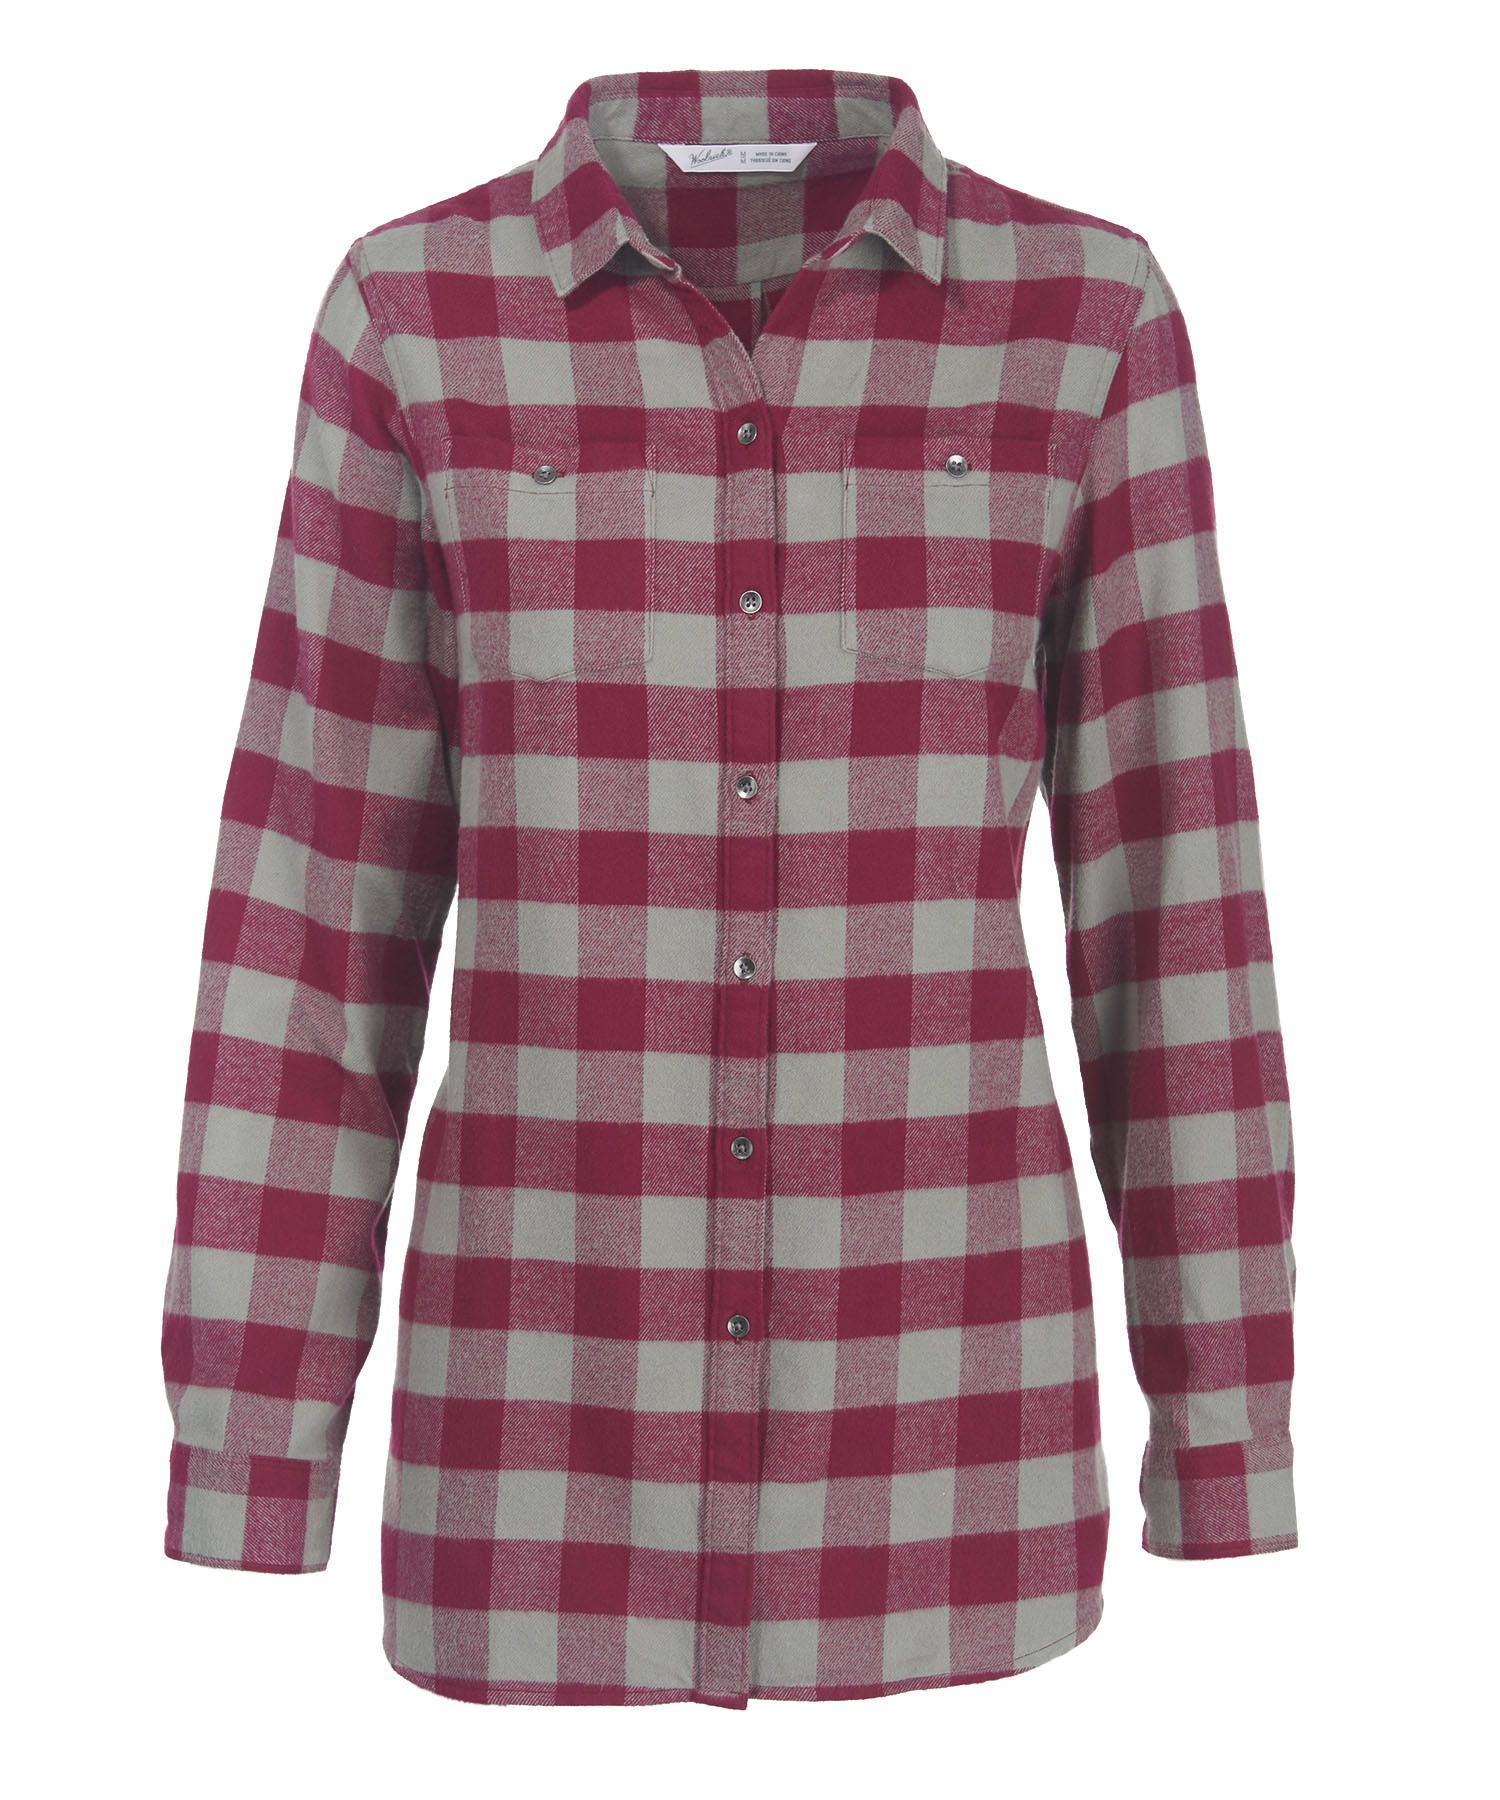 Gangster flannel shirts  Womenus Buffalo Check Boyfriend Tunic Flannel Shirt  Clothing